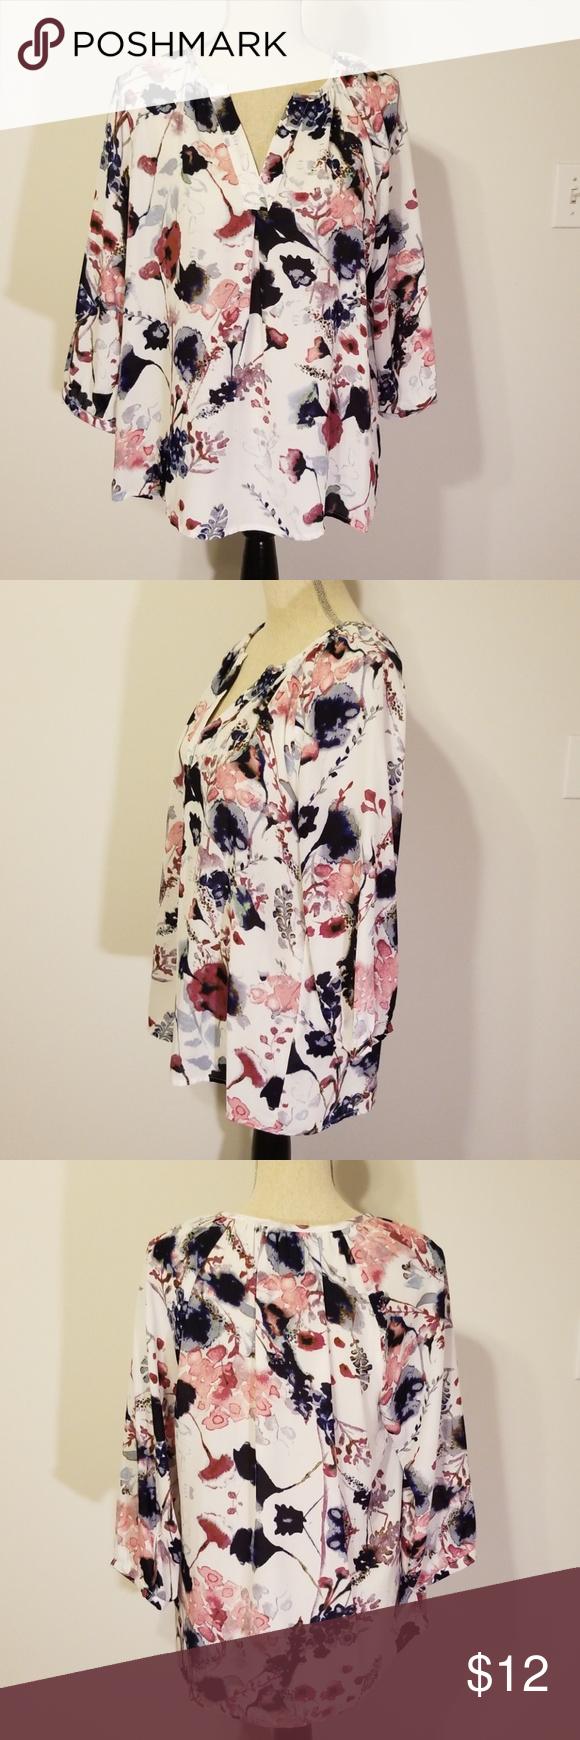 Rose Thyme Blouse In 2018 My Posh Picks Pinterest Fashion